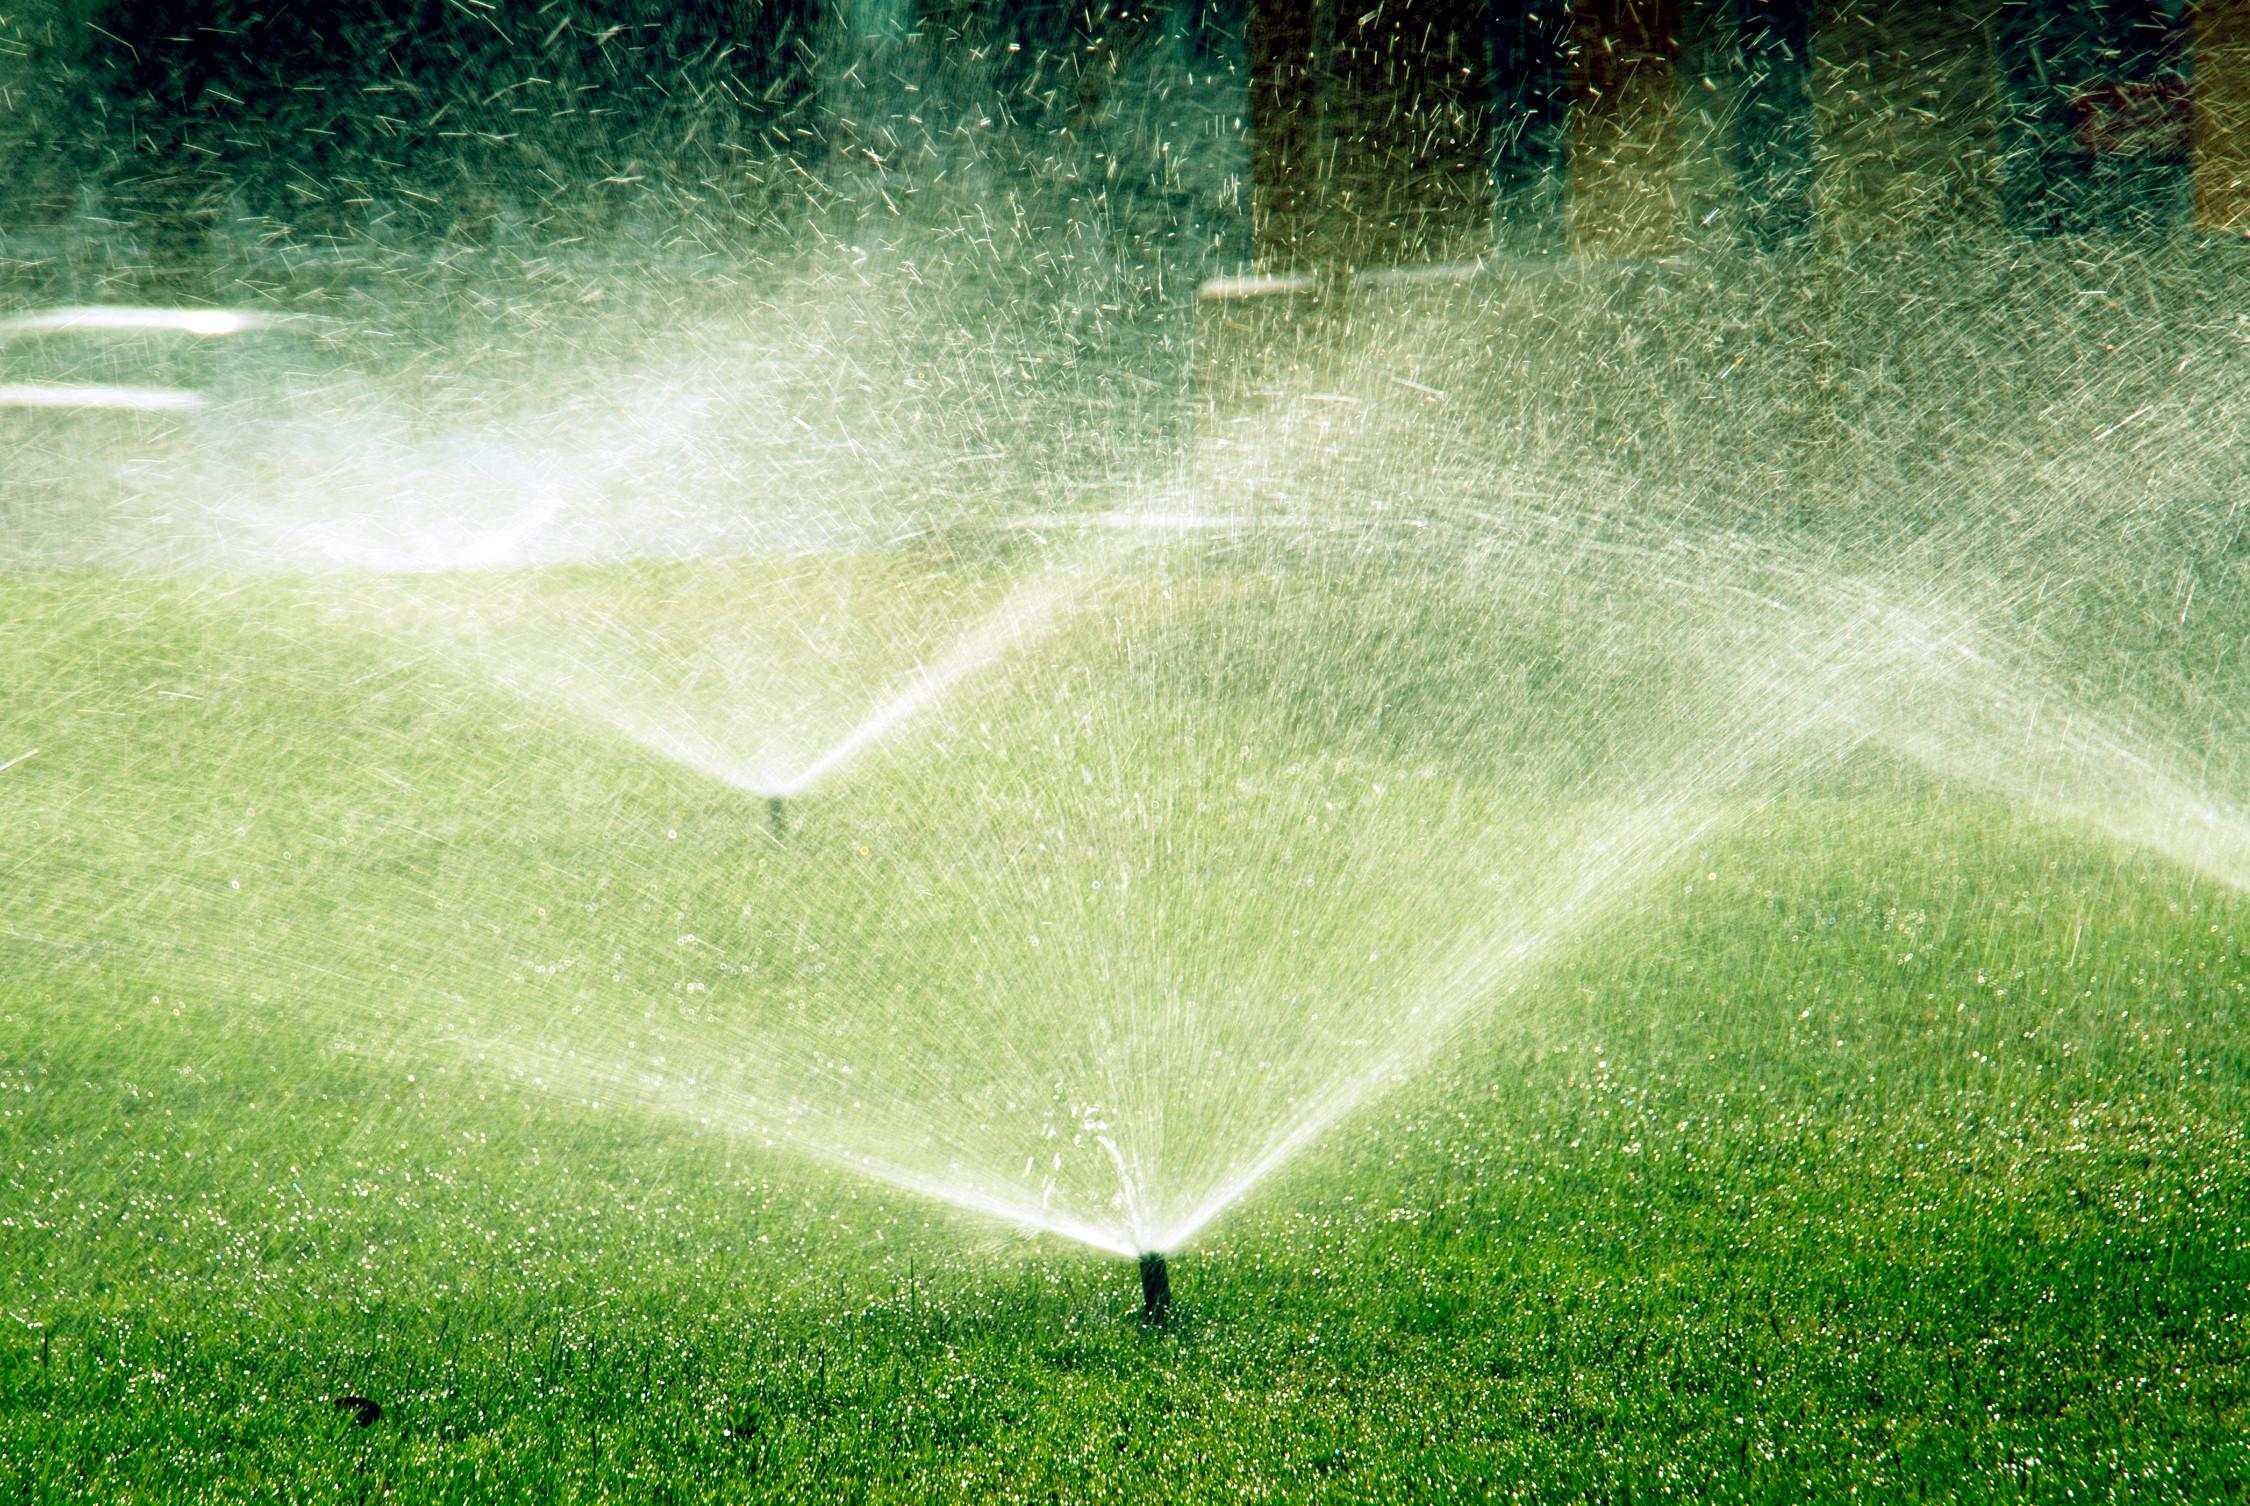 Pool, Irrigation, and Sprinkler Install